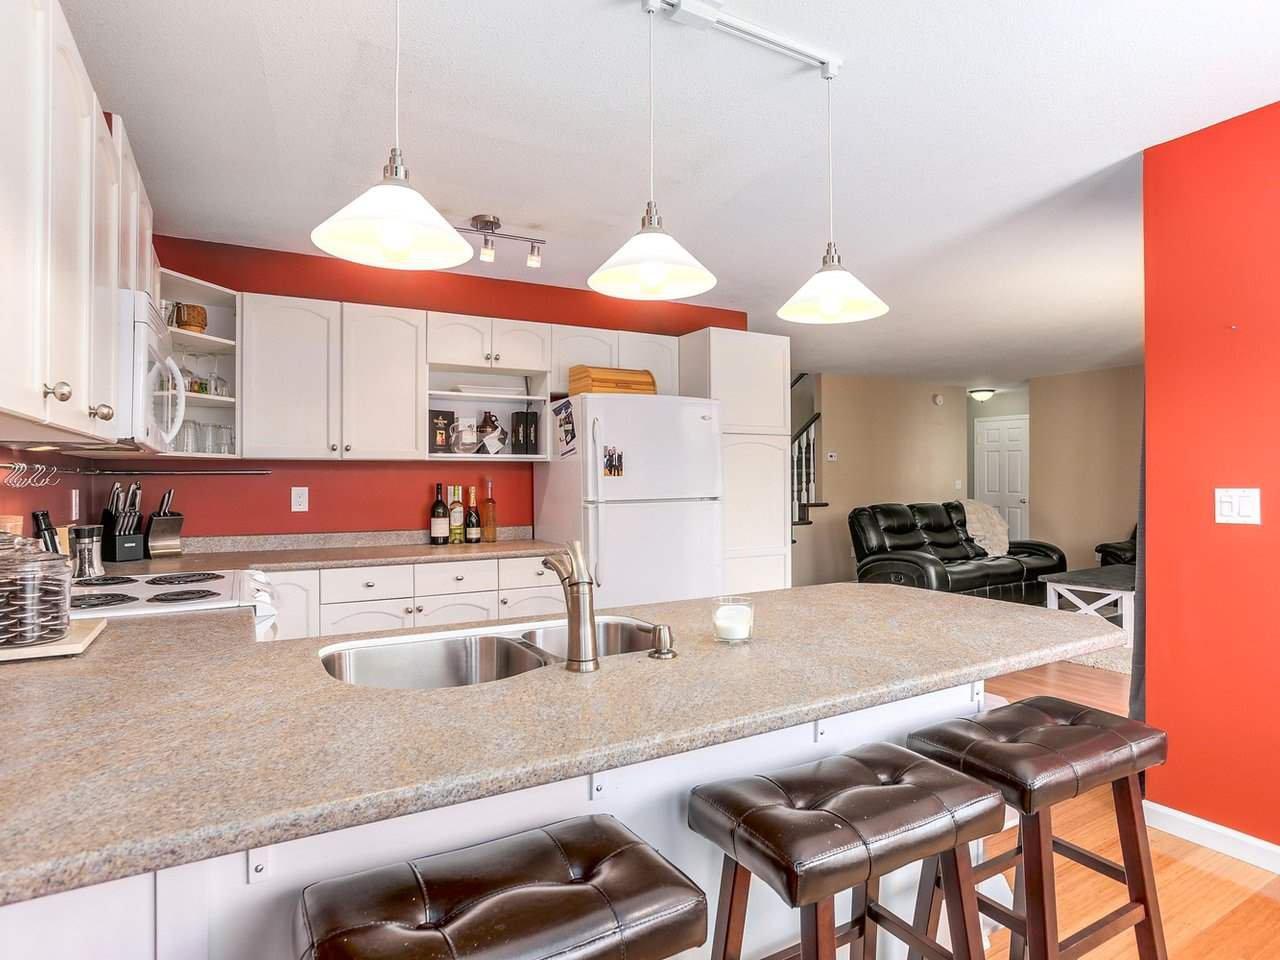 Photo 8: Photos: 1953 EUREKA Avenue in Port Coquitlam: Citadel PQ House for sale : MLS®# R2184941